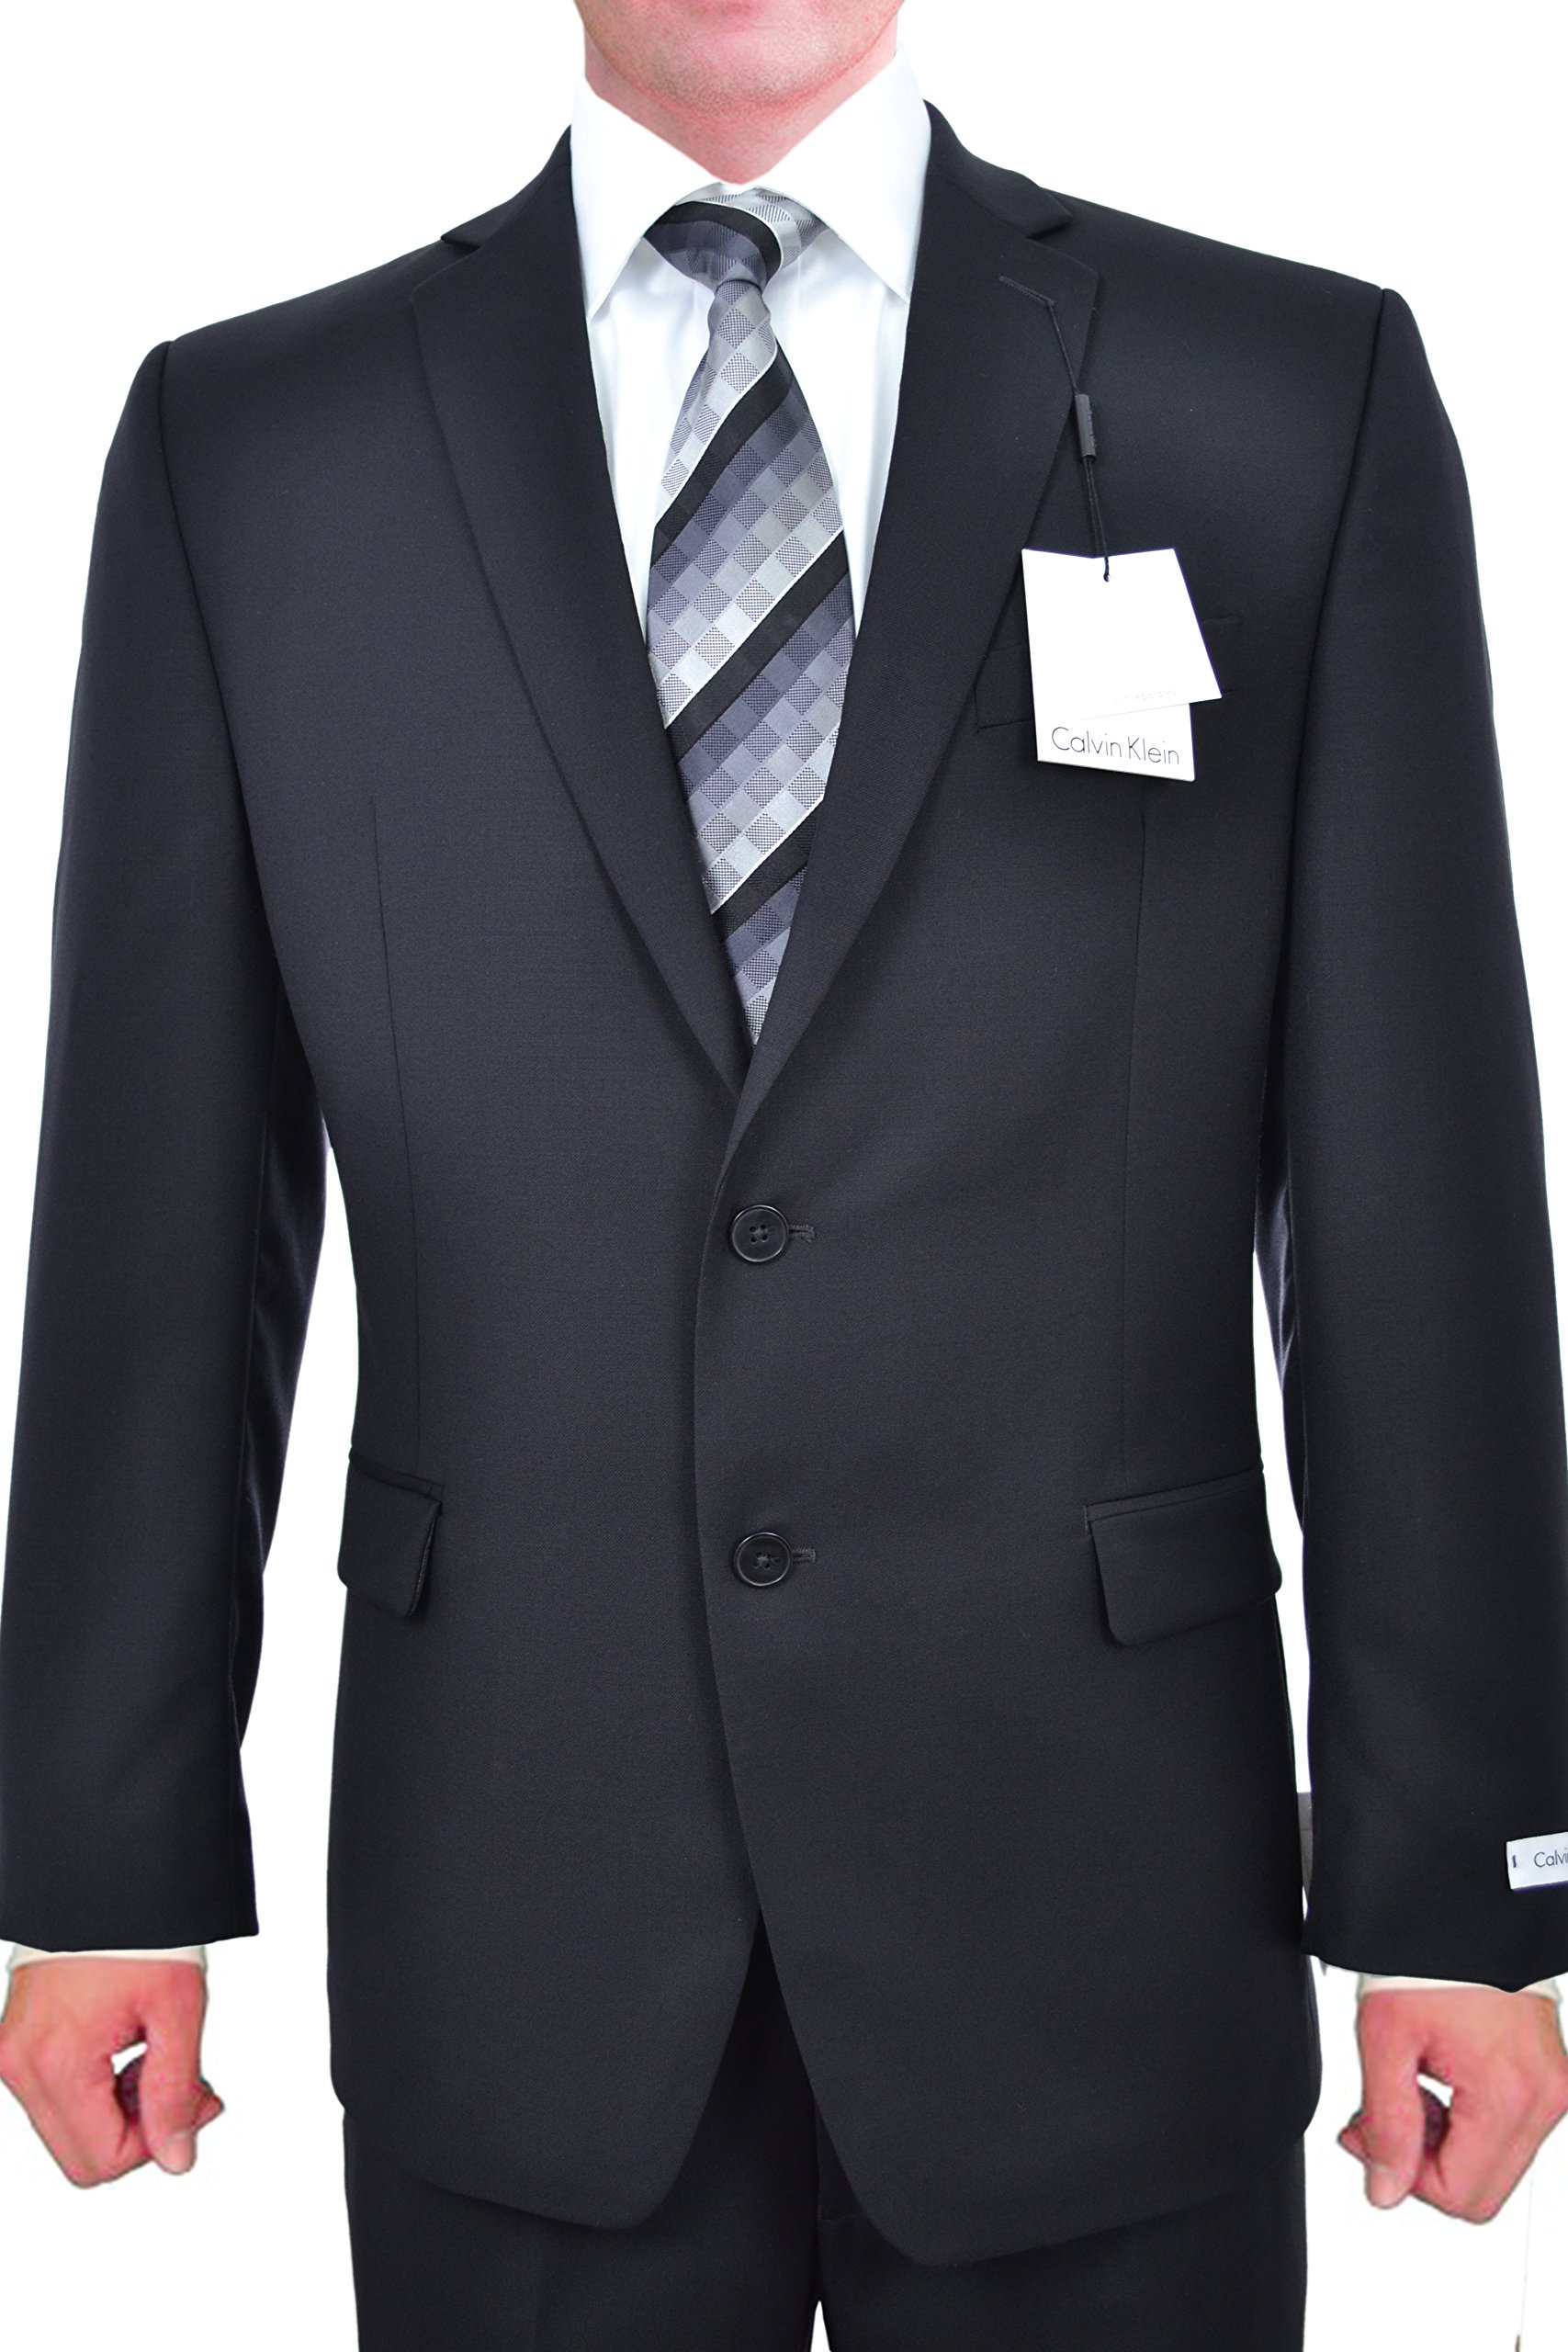 Calvin Klein Slim Fit Black Solid Two Button Wool New Men's Suit Set (38S 34W x 32L) by Calvin + Klein